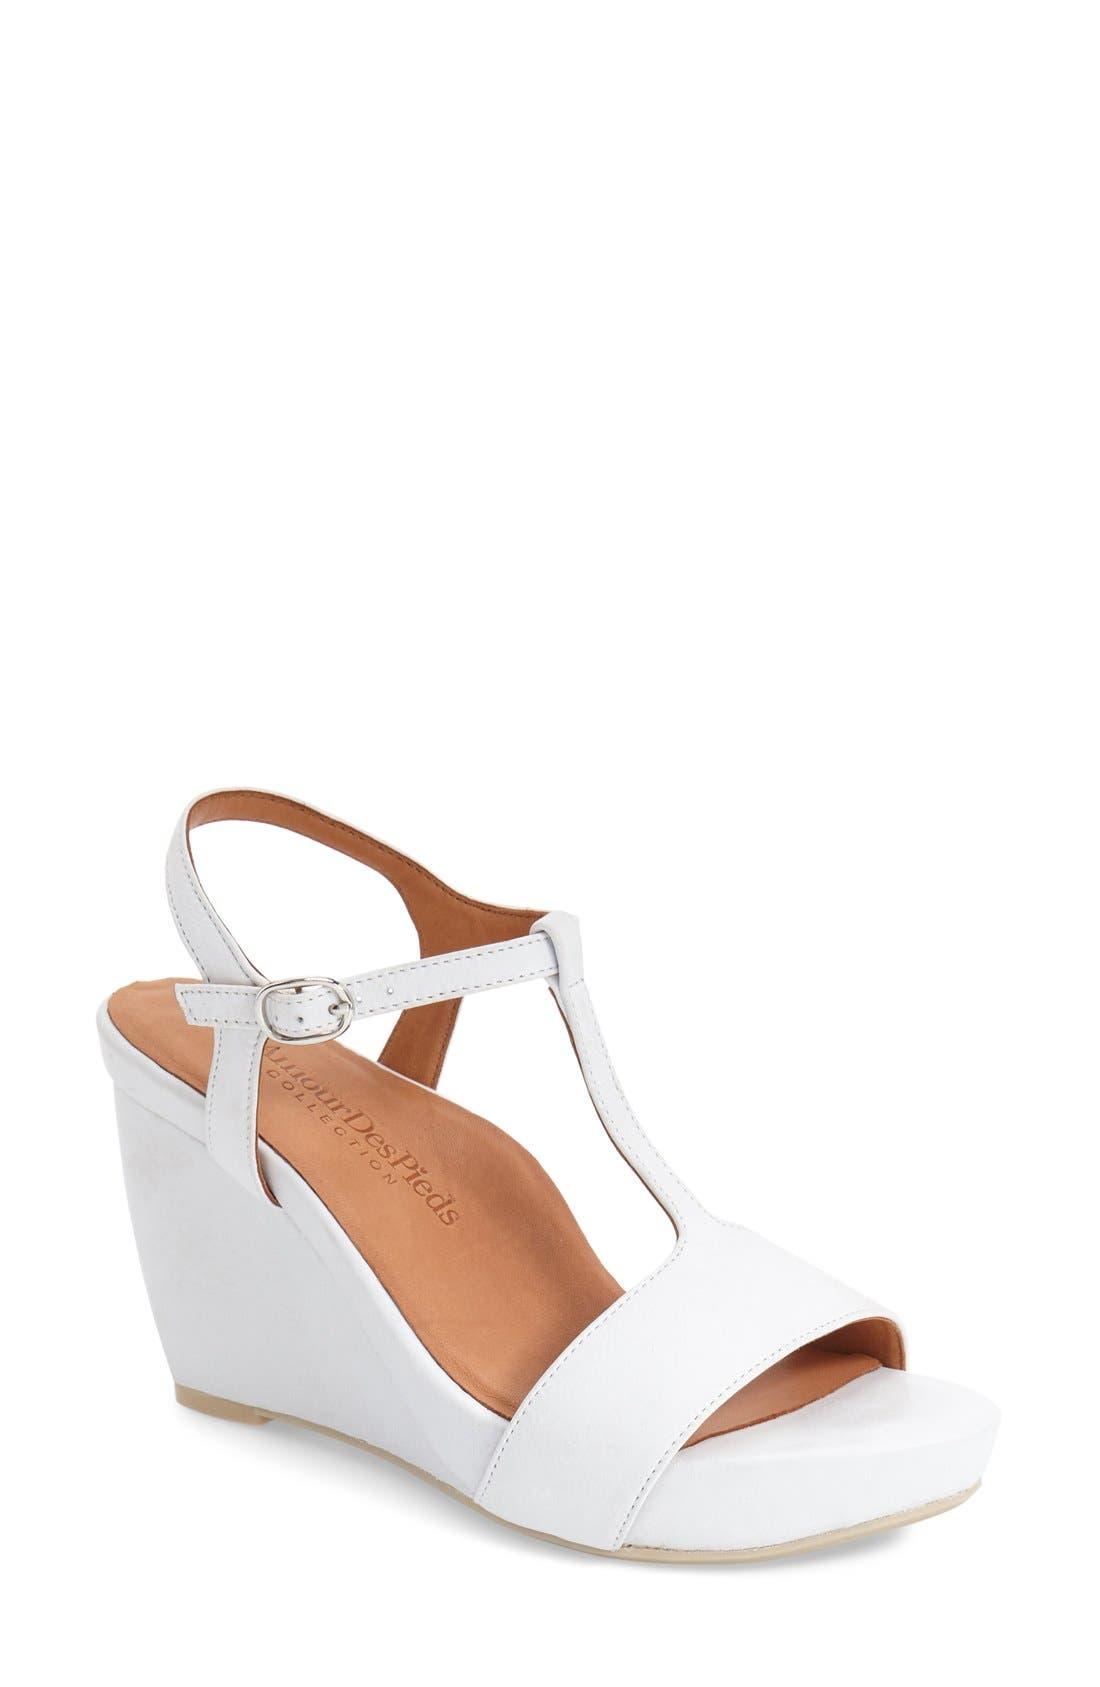 'Idelle' Platform Wedge Sandal, Main, color, WHITE LEATHER